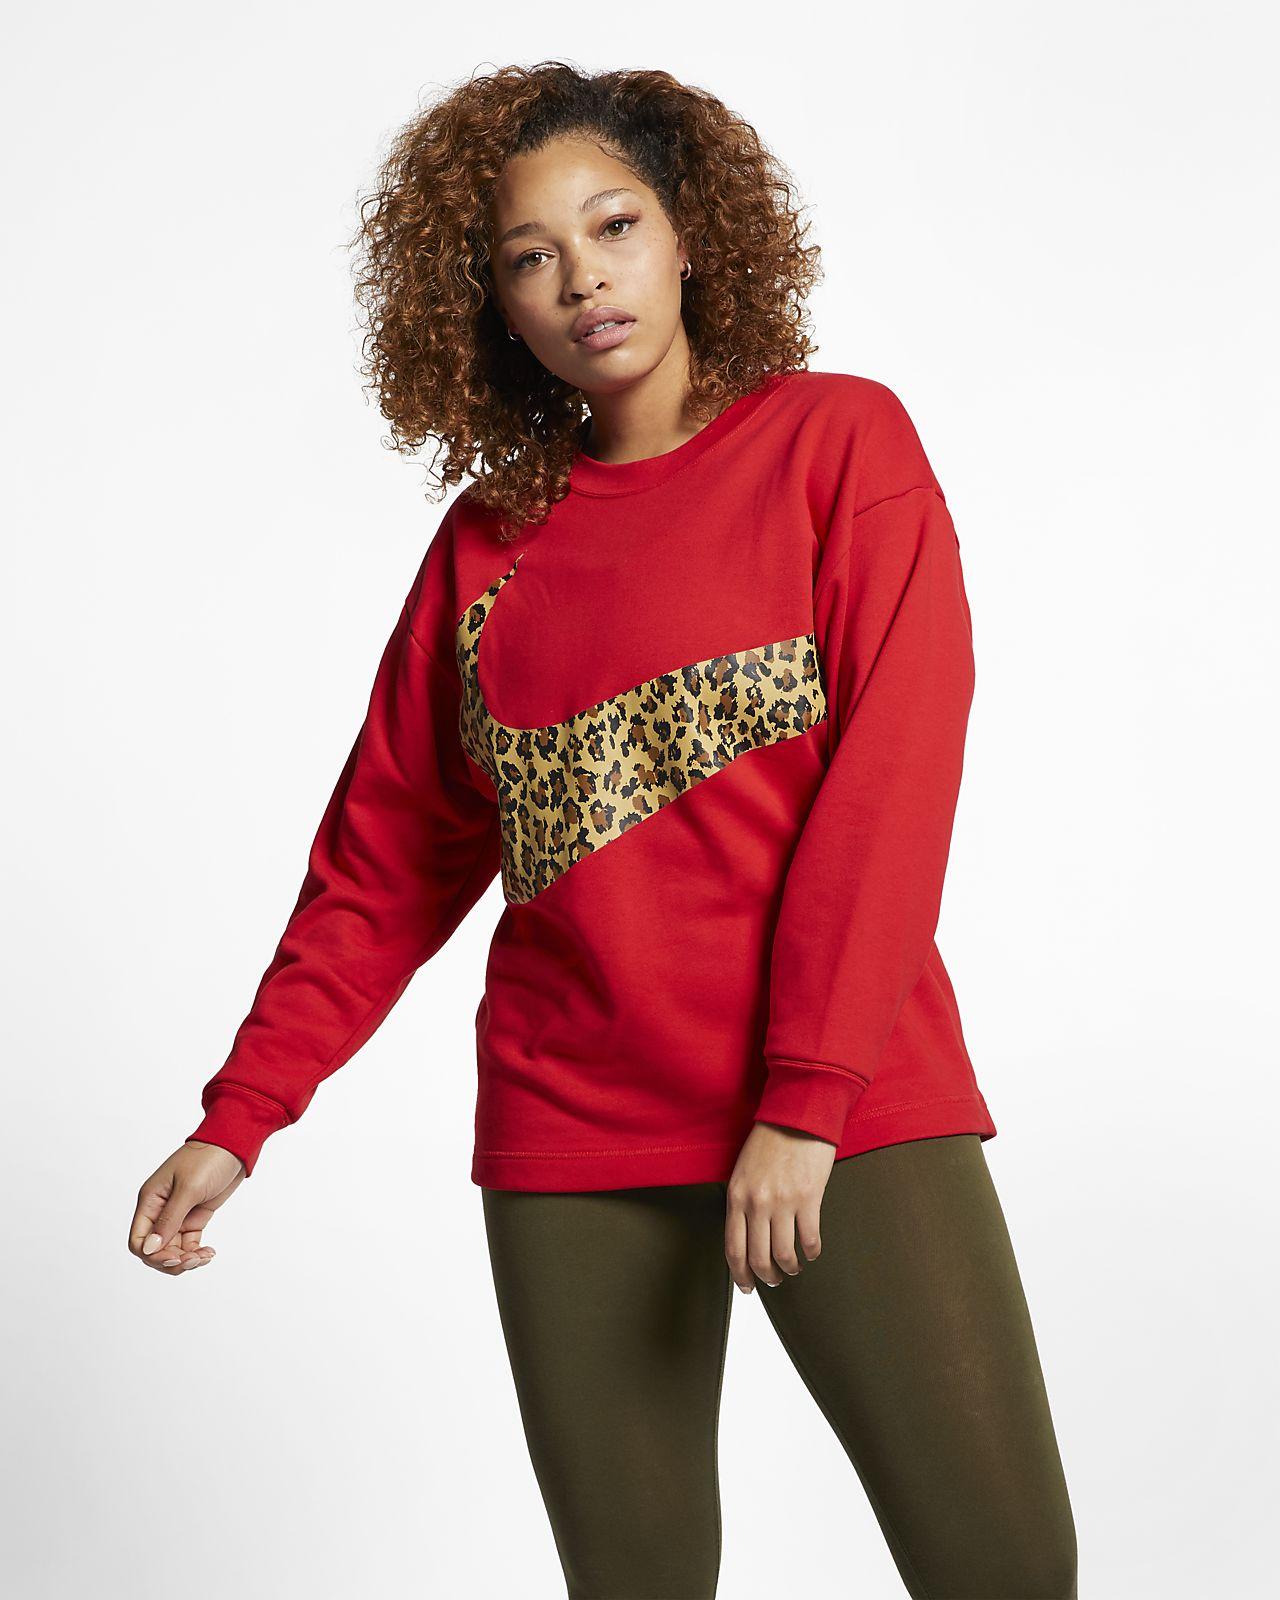 Nike Sportswear Women's Animal Crew (Plus Size)